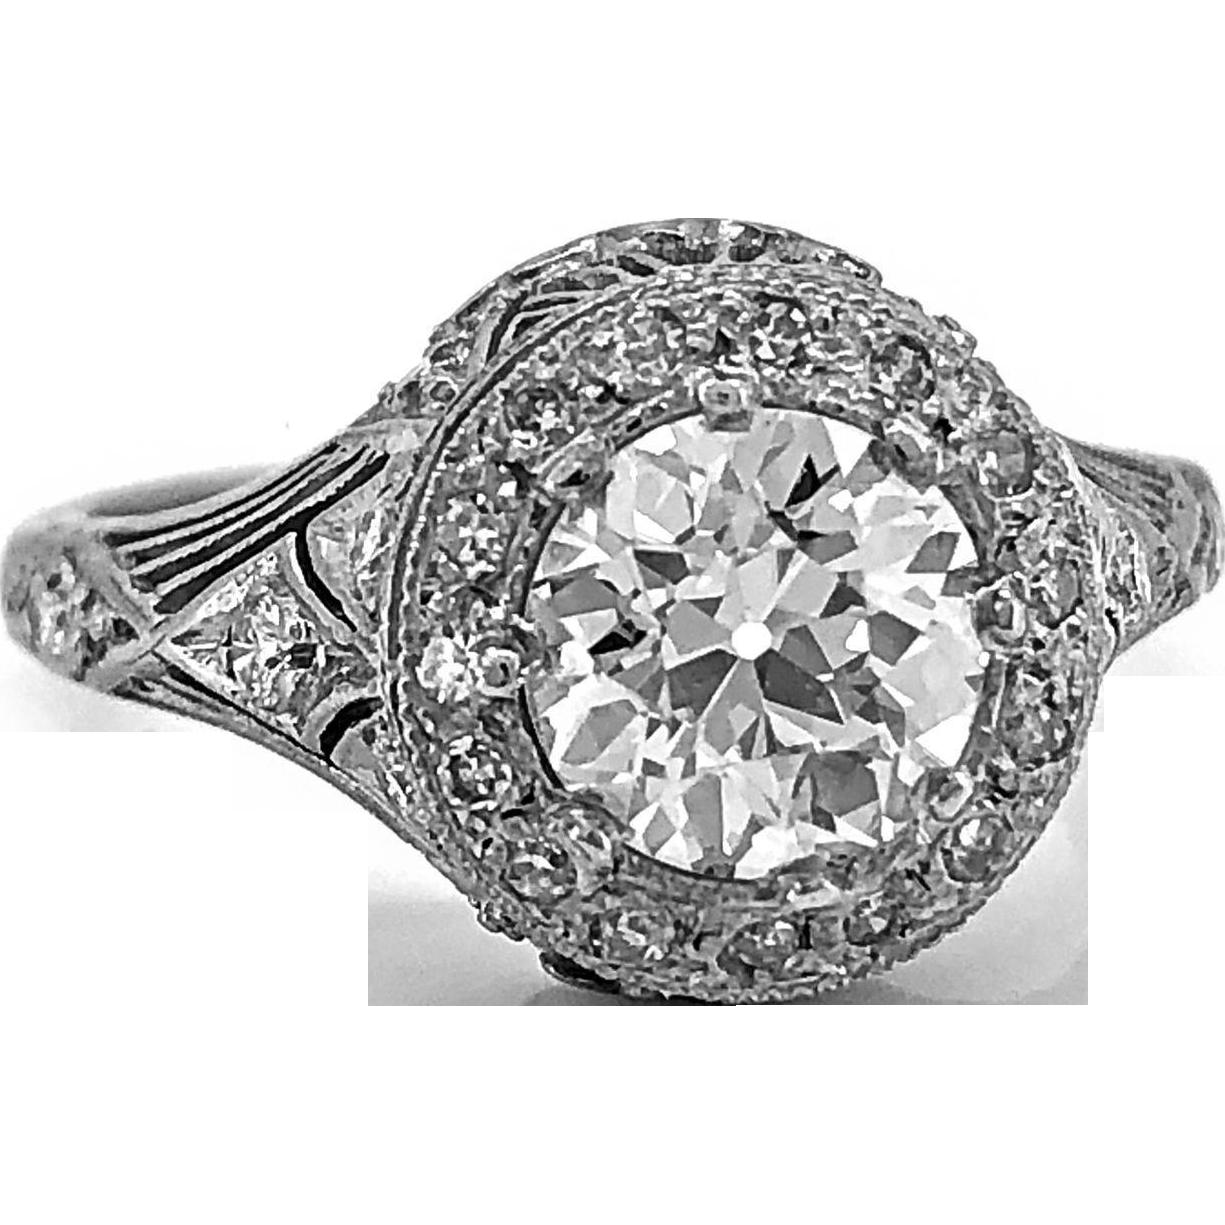 Art Deco Diamond Antique Engagement Ring 1.20ct. White Gold